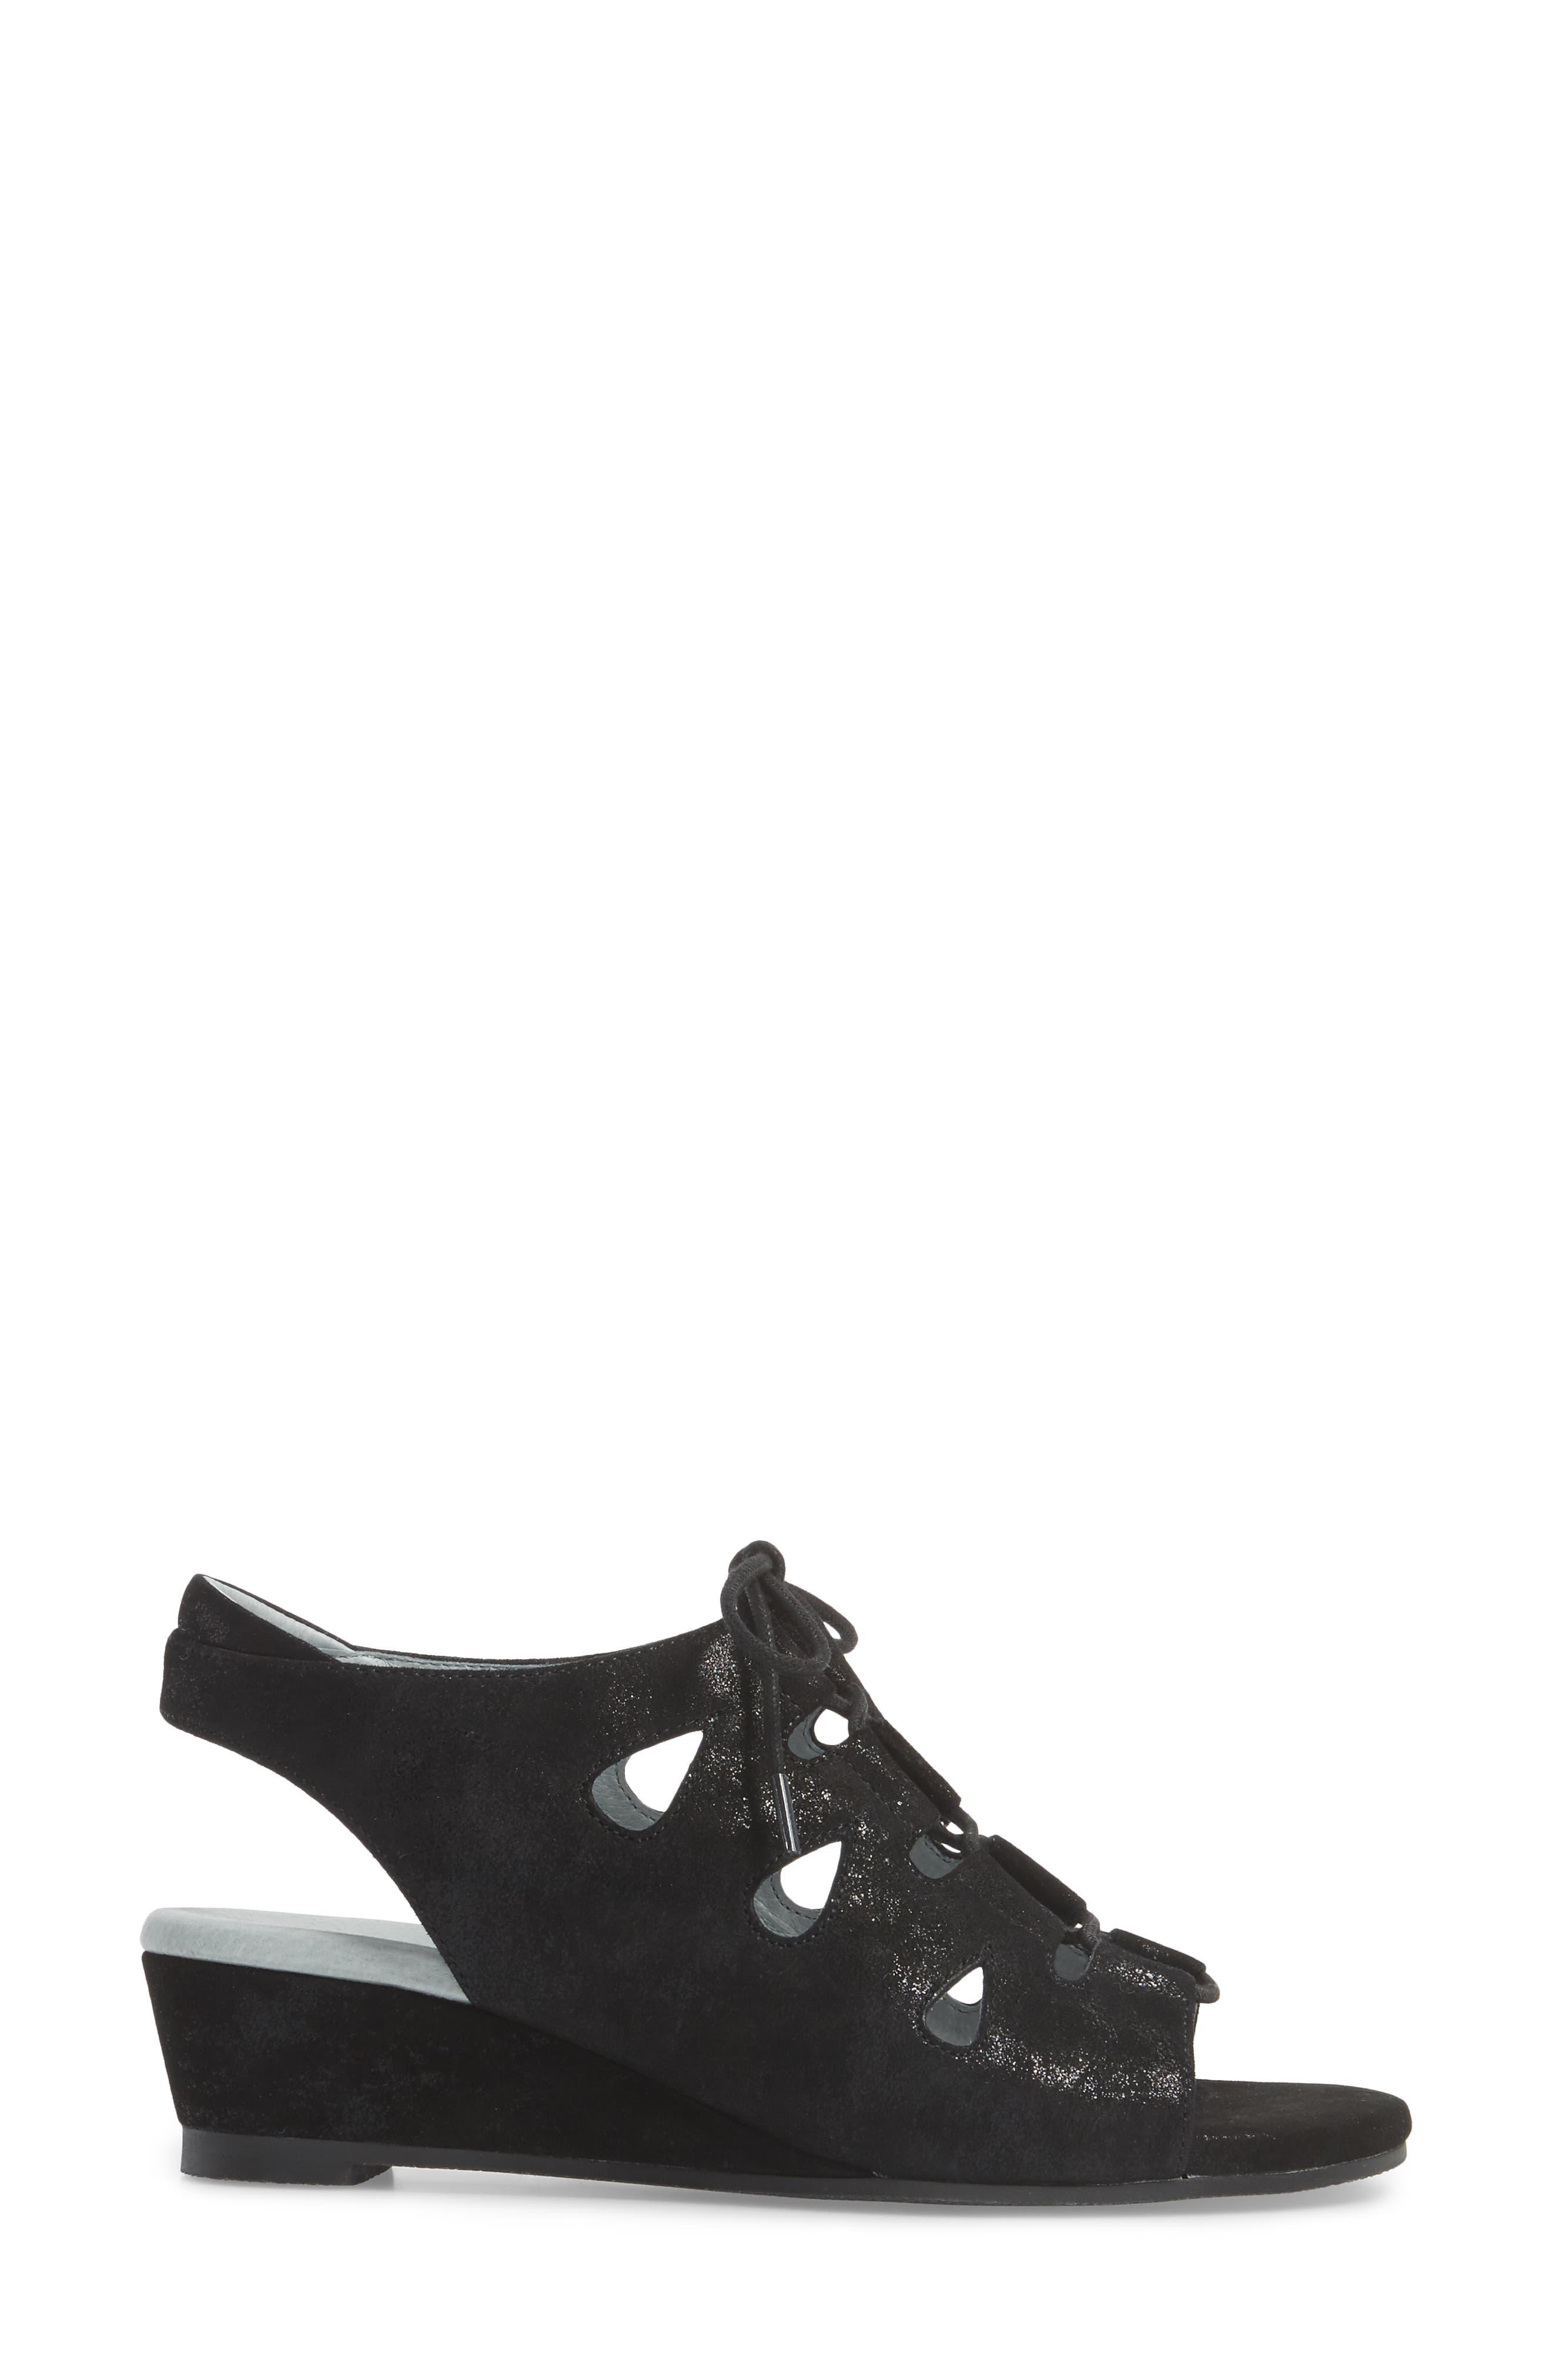 Rich Wedge Sandal,                             Alternate thumbnail 3, color,                             Black Suede